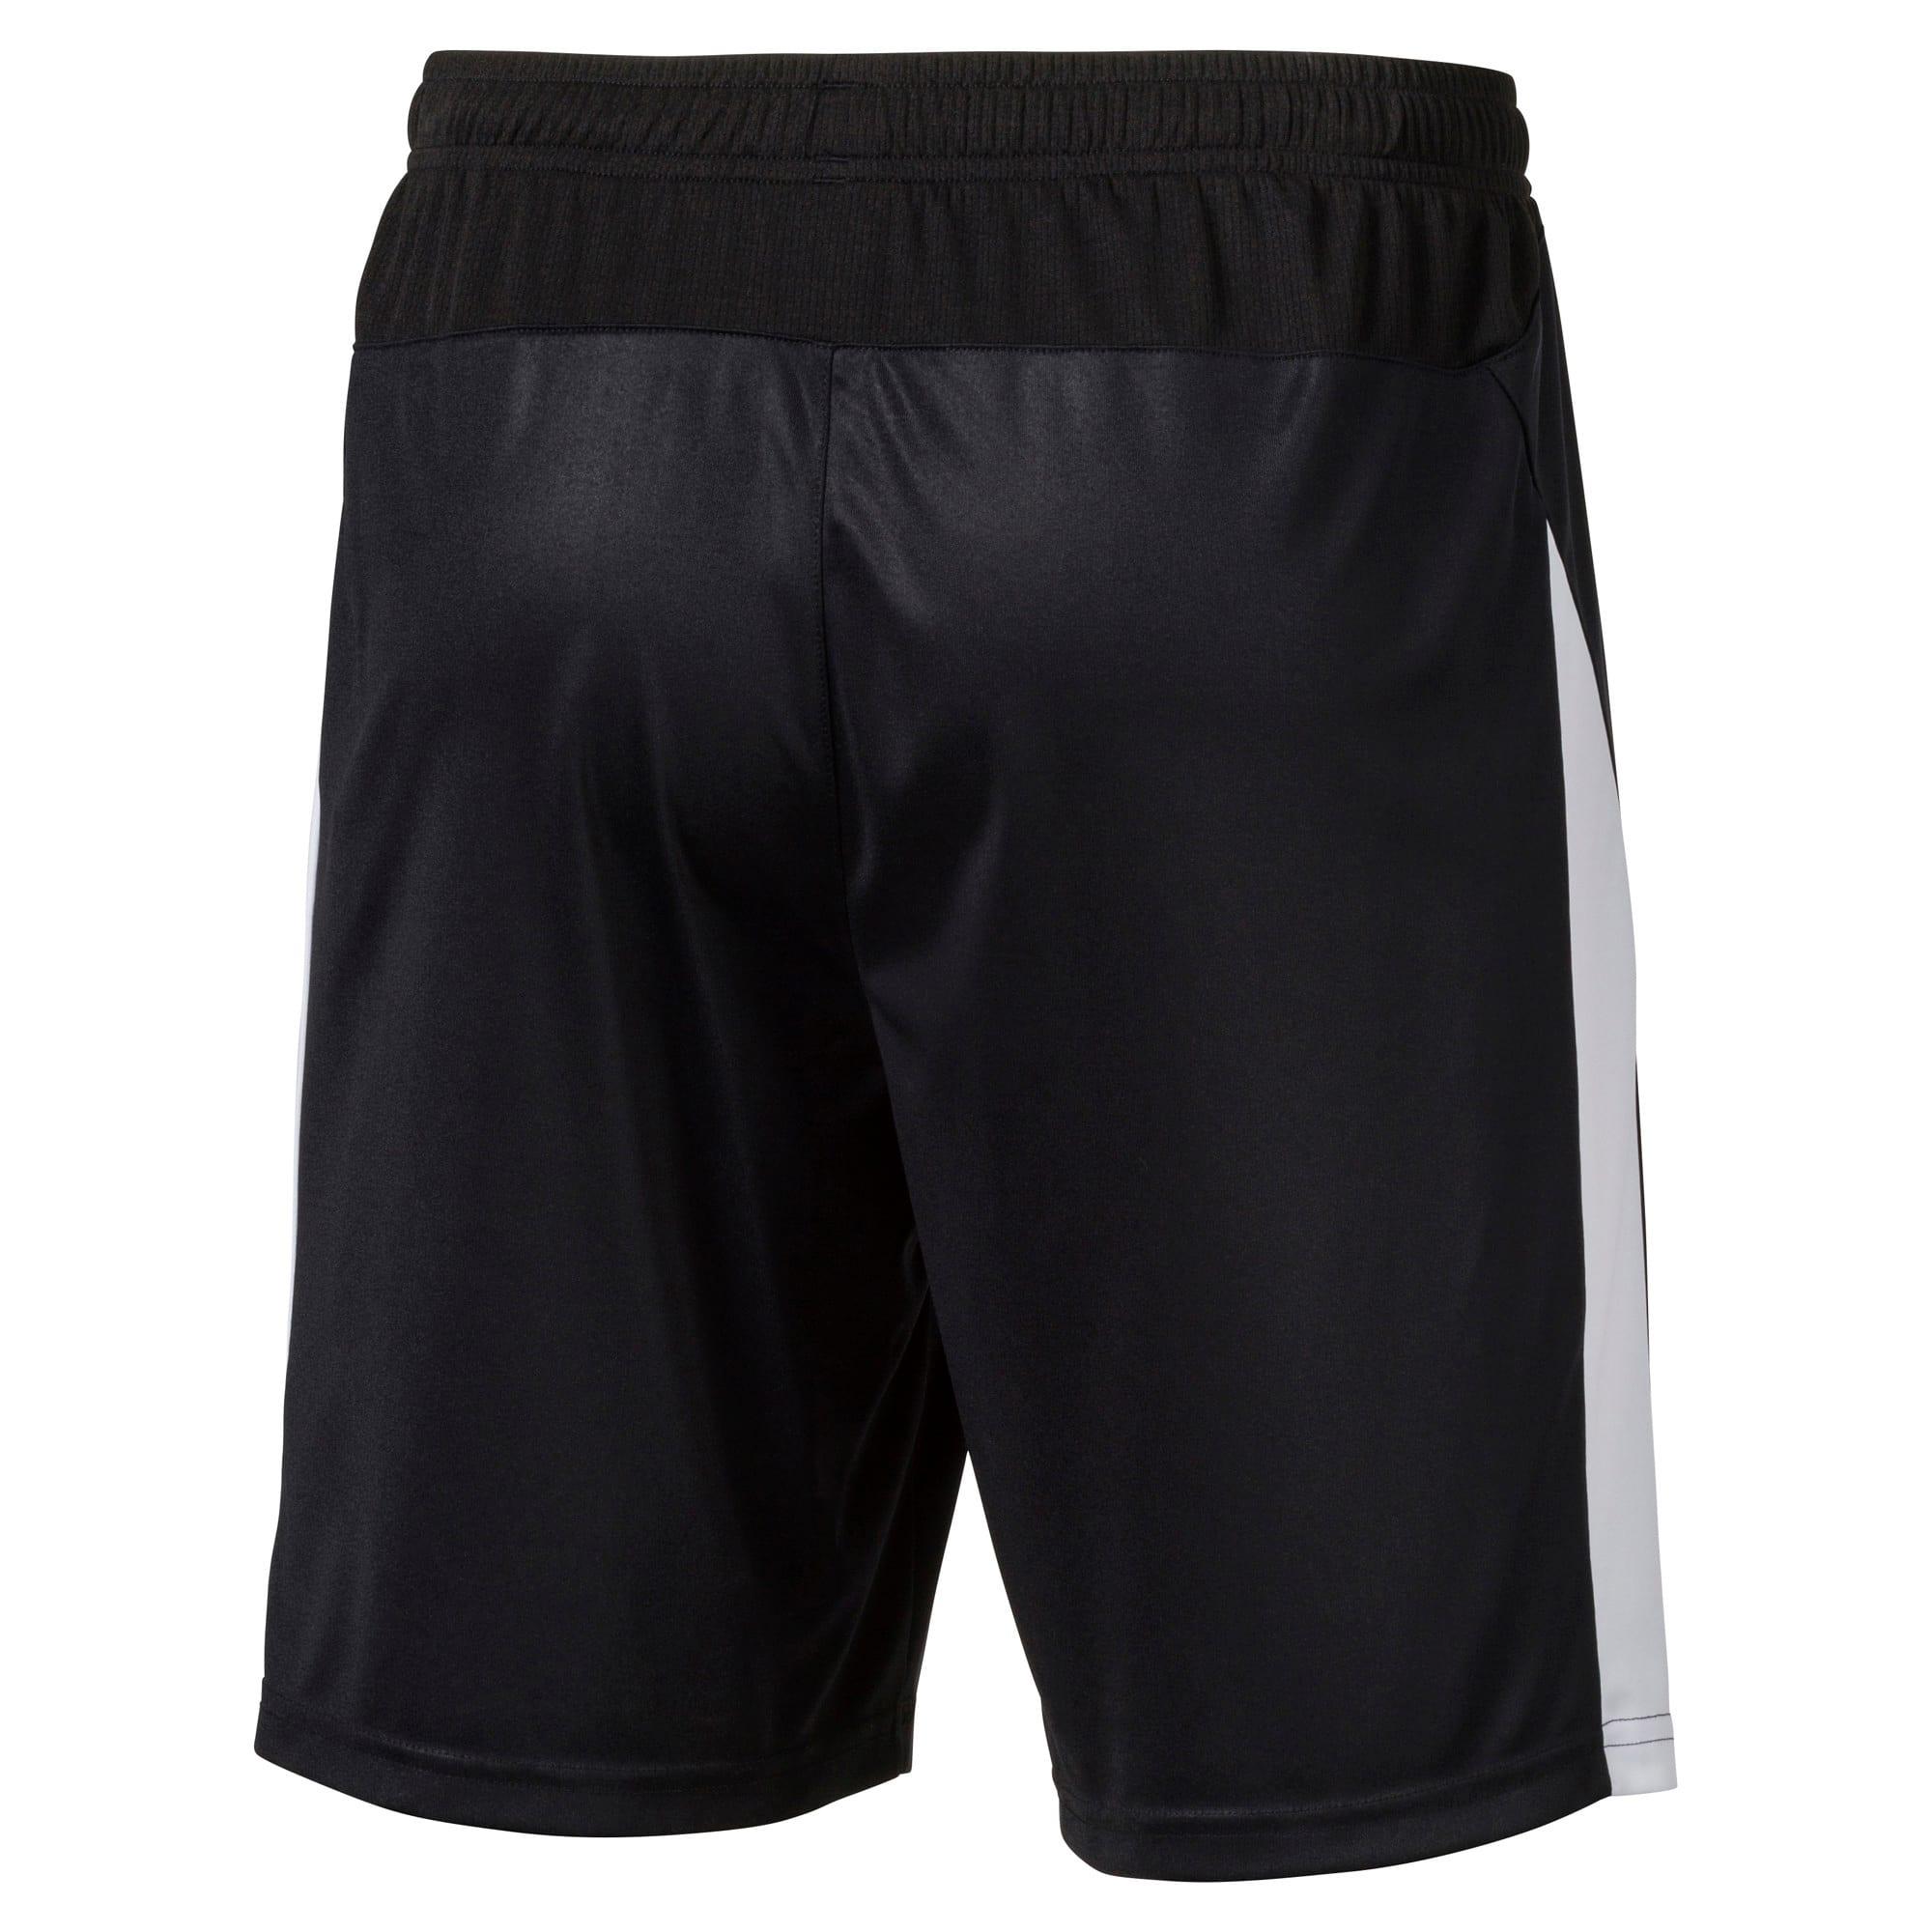 Thumbnail 4 of Liga Men's Shorts, Puma Black-Puma White, medium